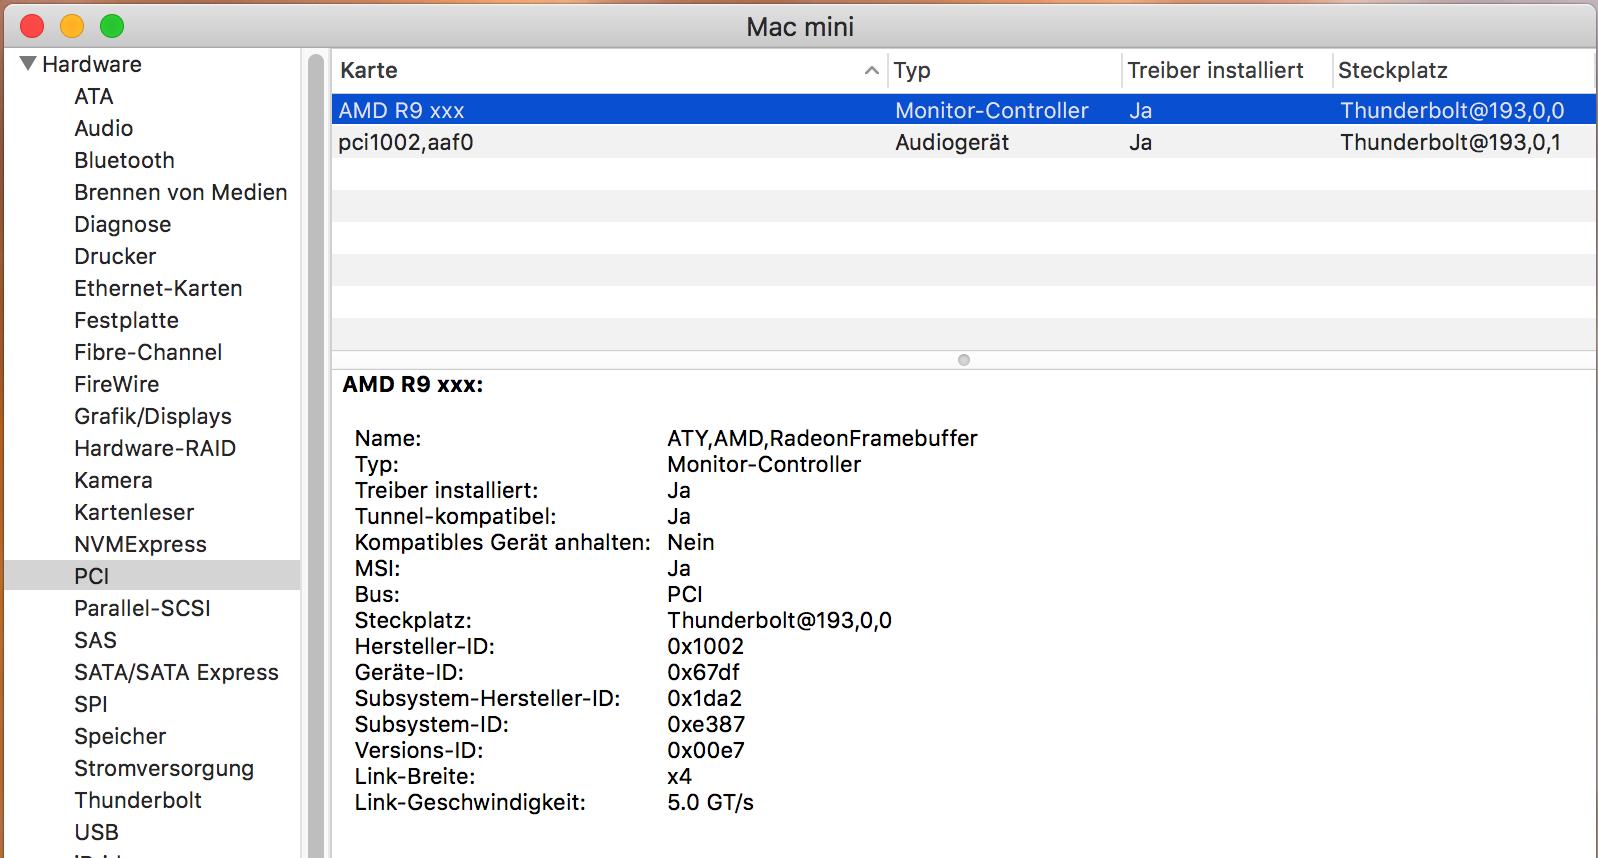 AMD Radeon RX 580 works in macOS | Page 6 | MacRumors Forums